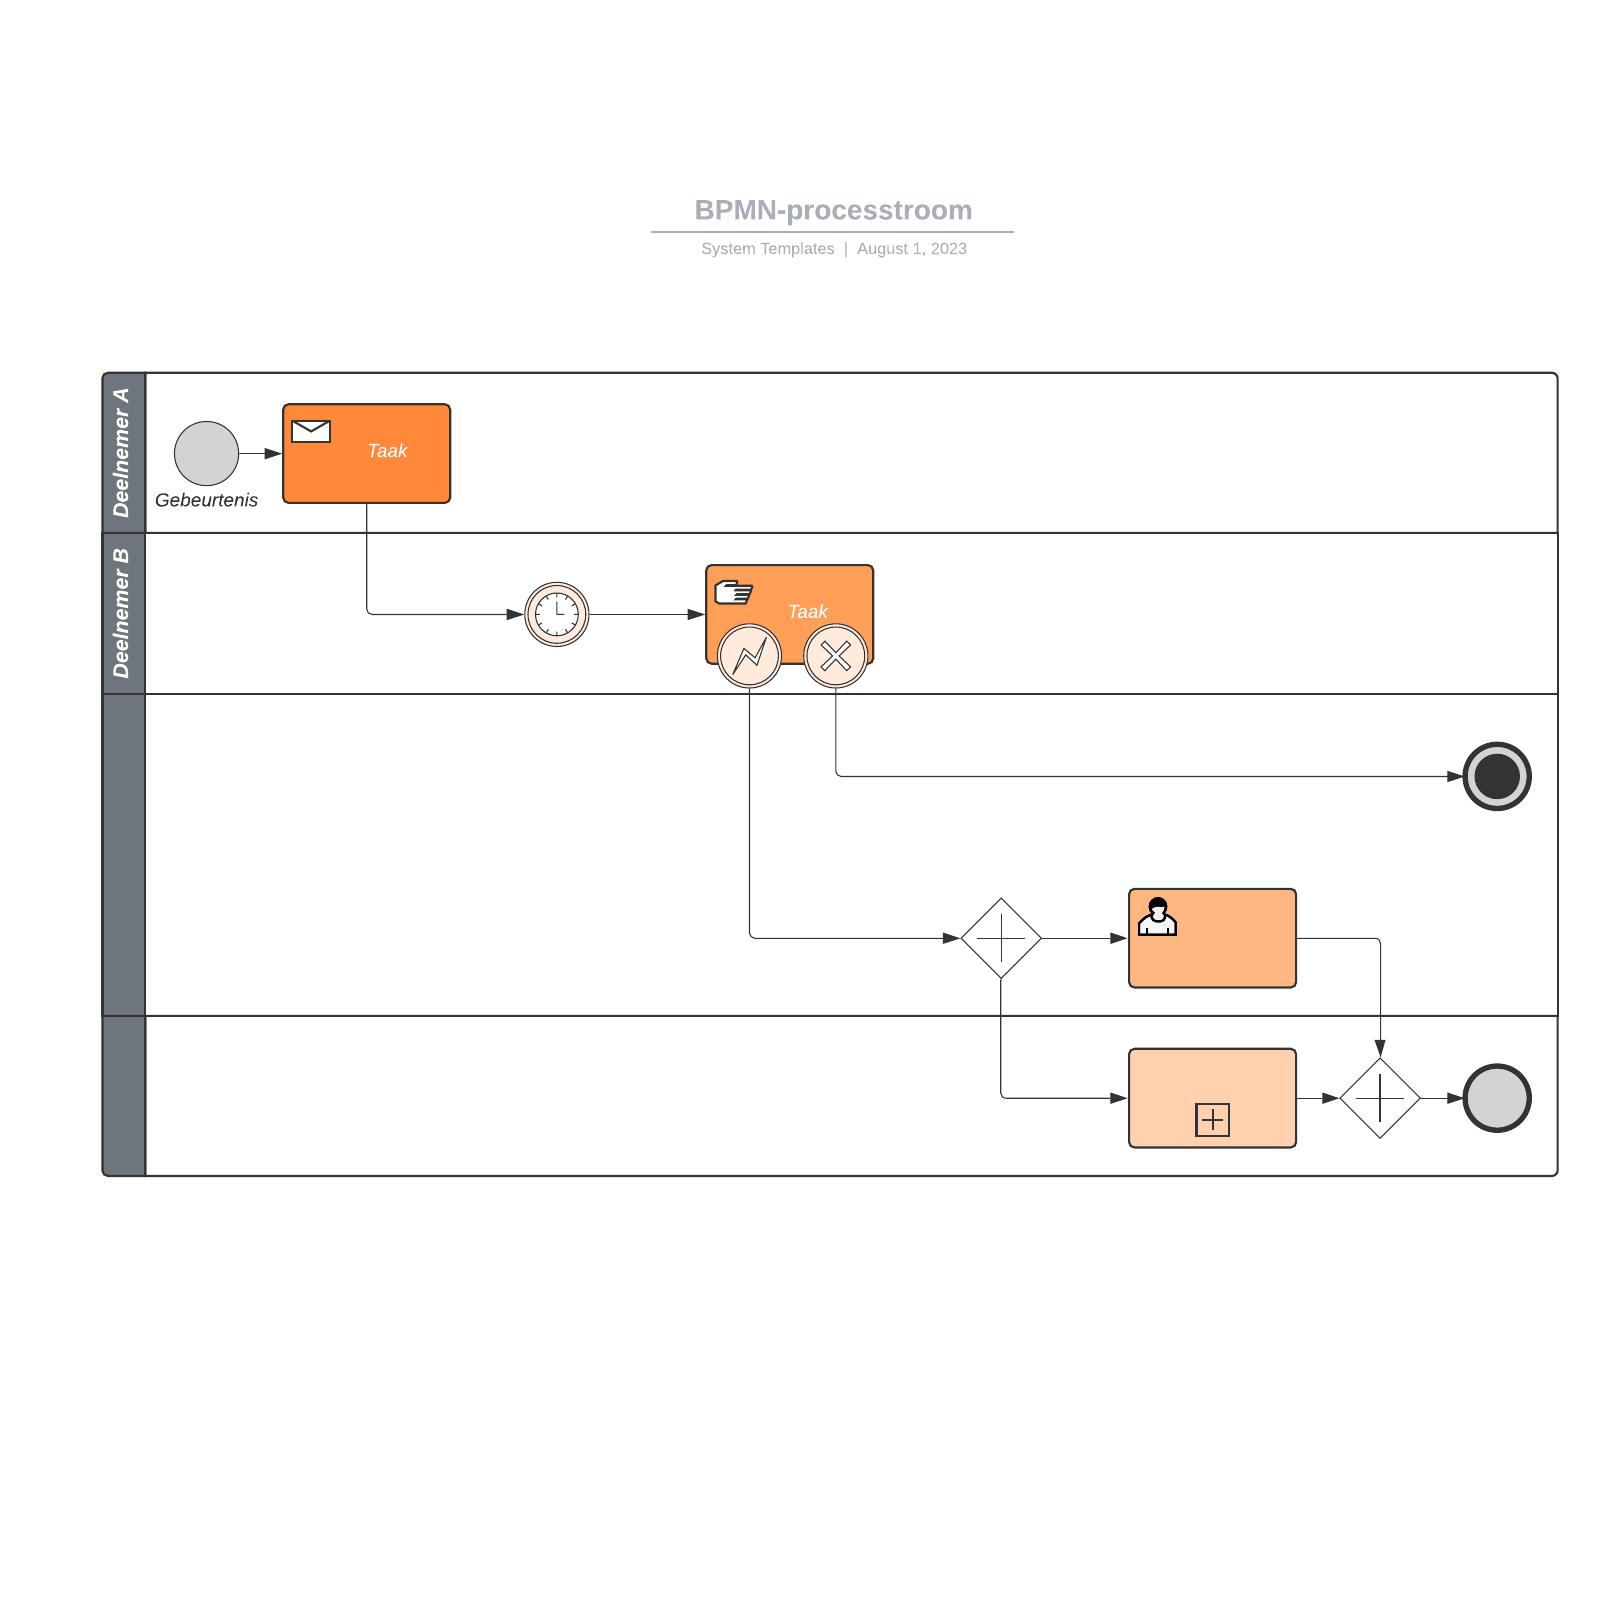 BPMN-processtroom